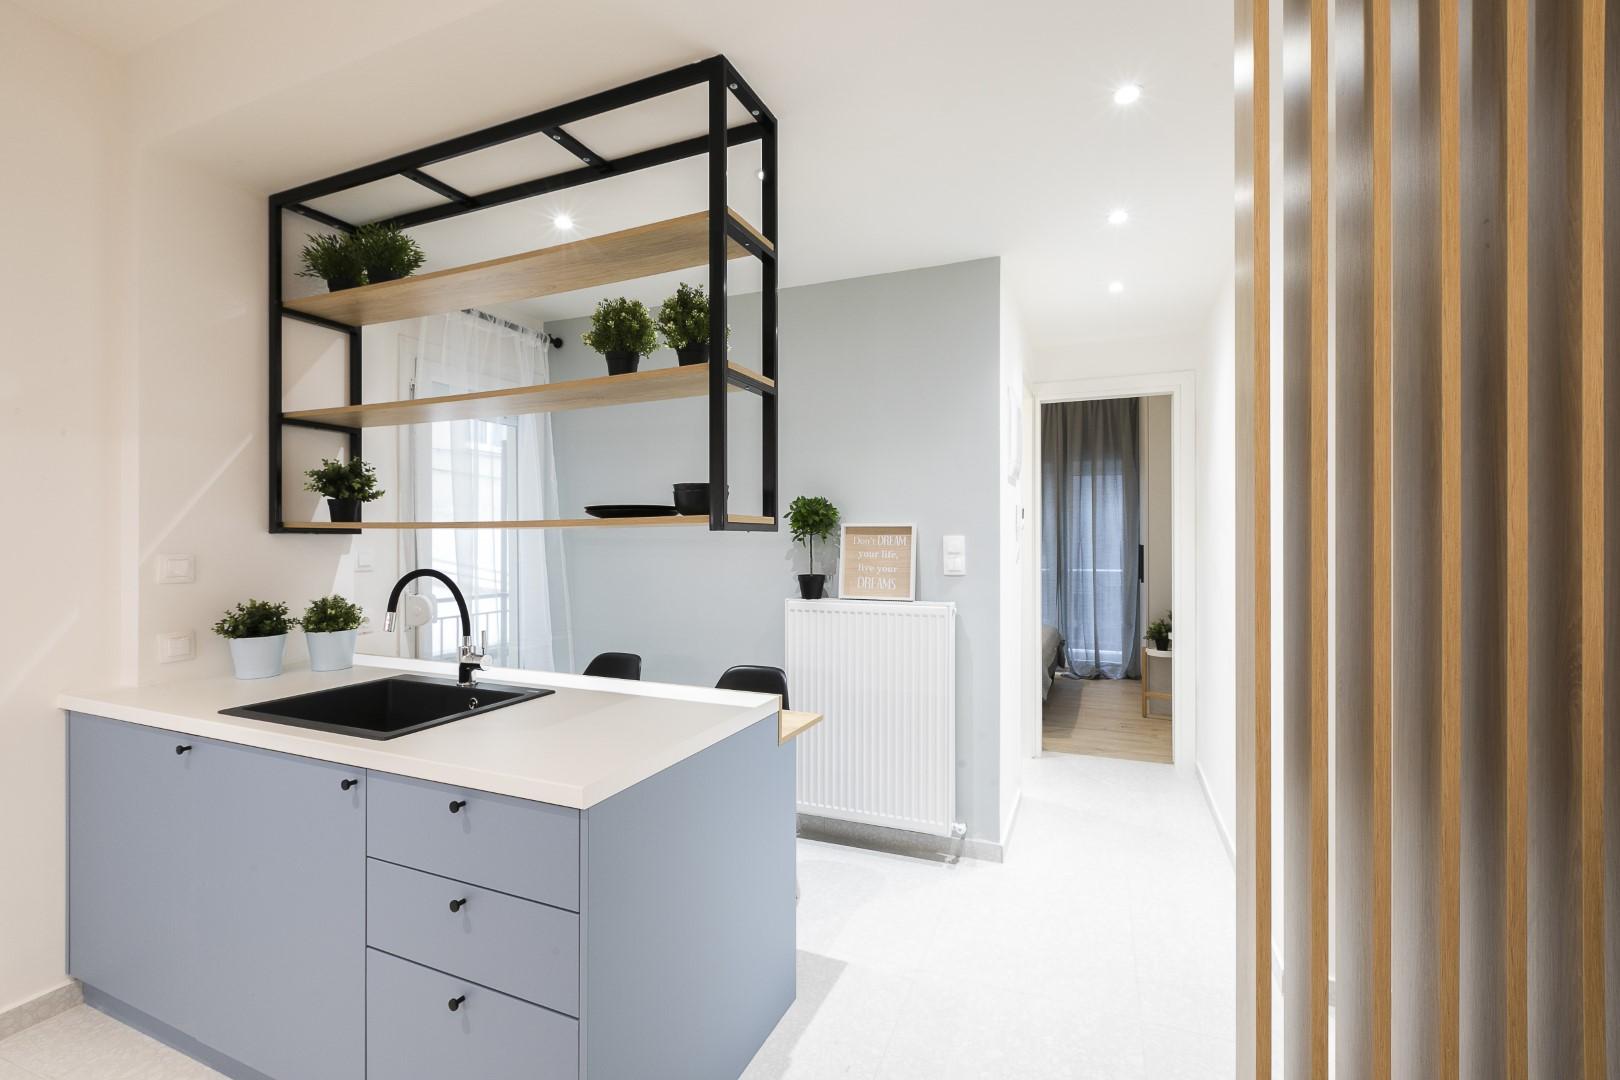 Apartment renovation | Αg.Sofias | 45 sq.m. | 1st floor